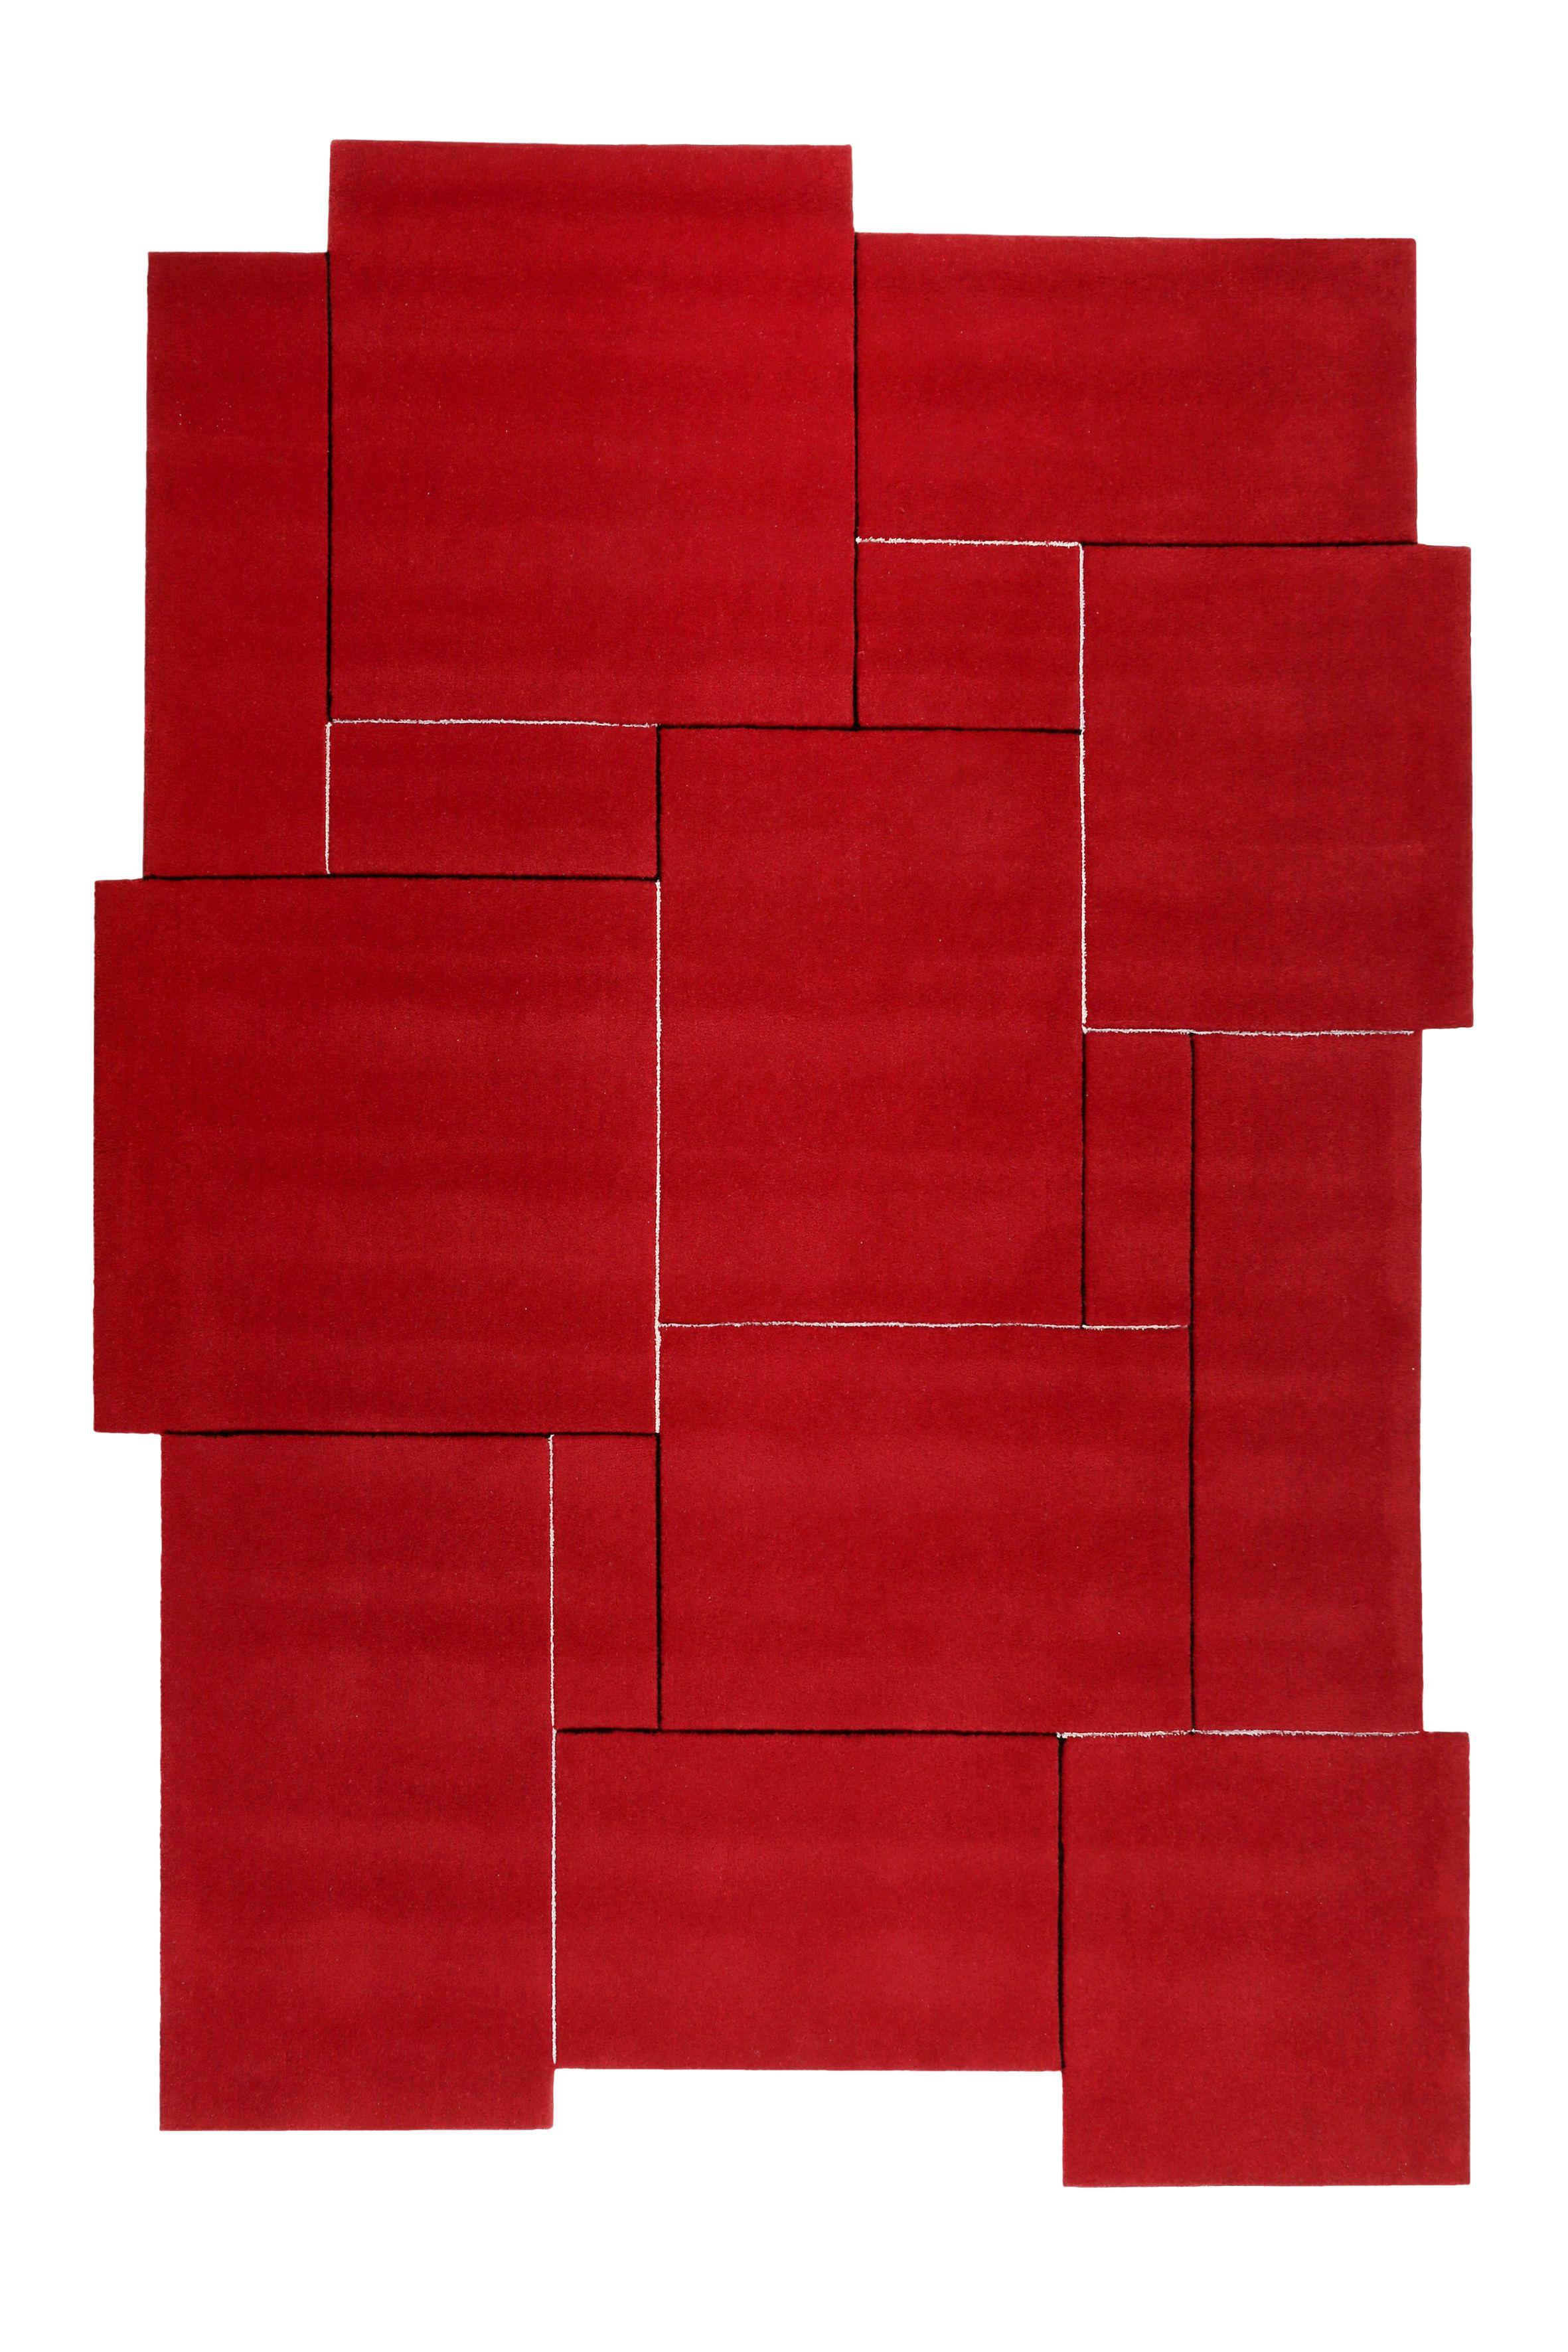 Esprit Kurzflor Teppich Aus Wolle Puzzle Rot Teppich Kurzflor Teppiche Teppich Wohnzimmer